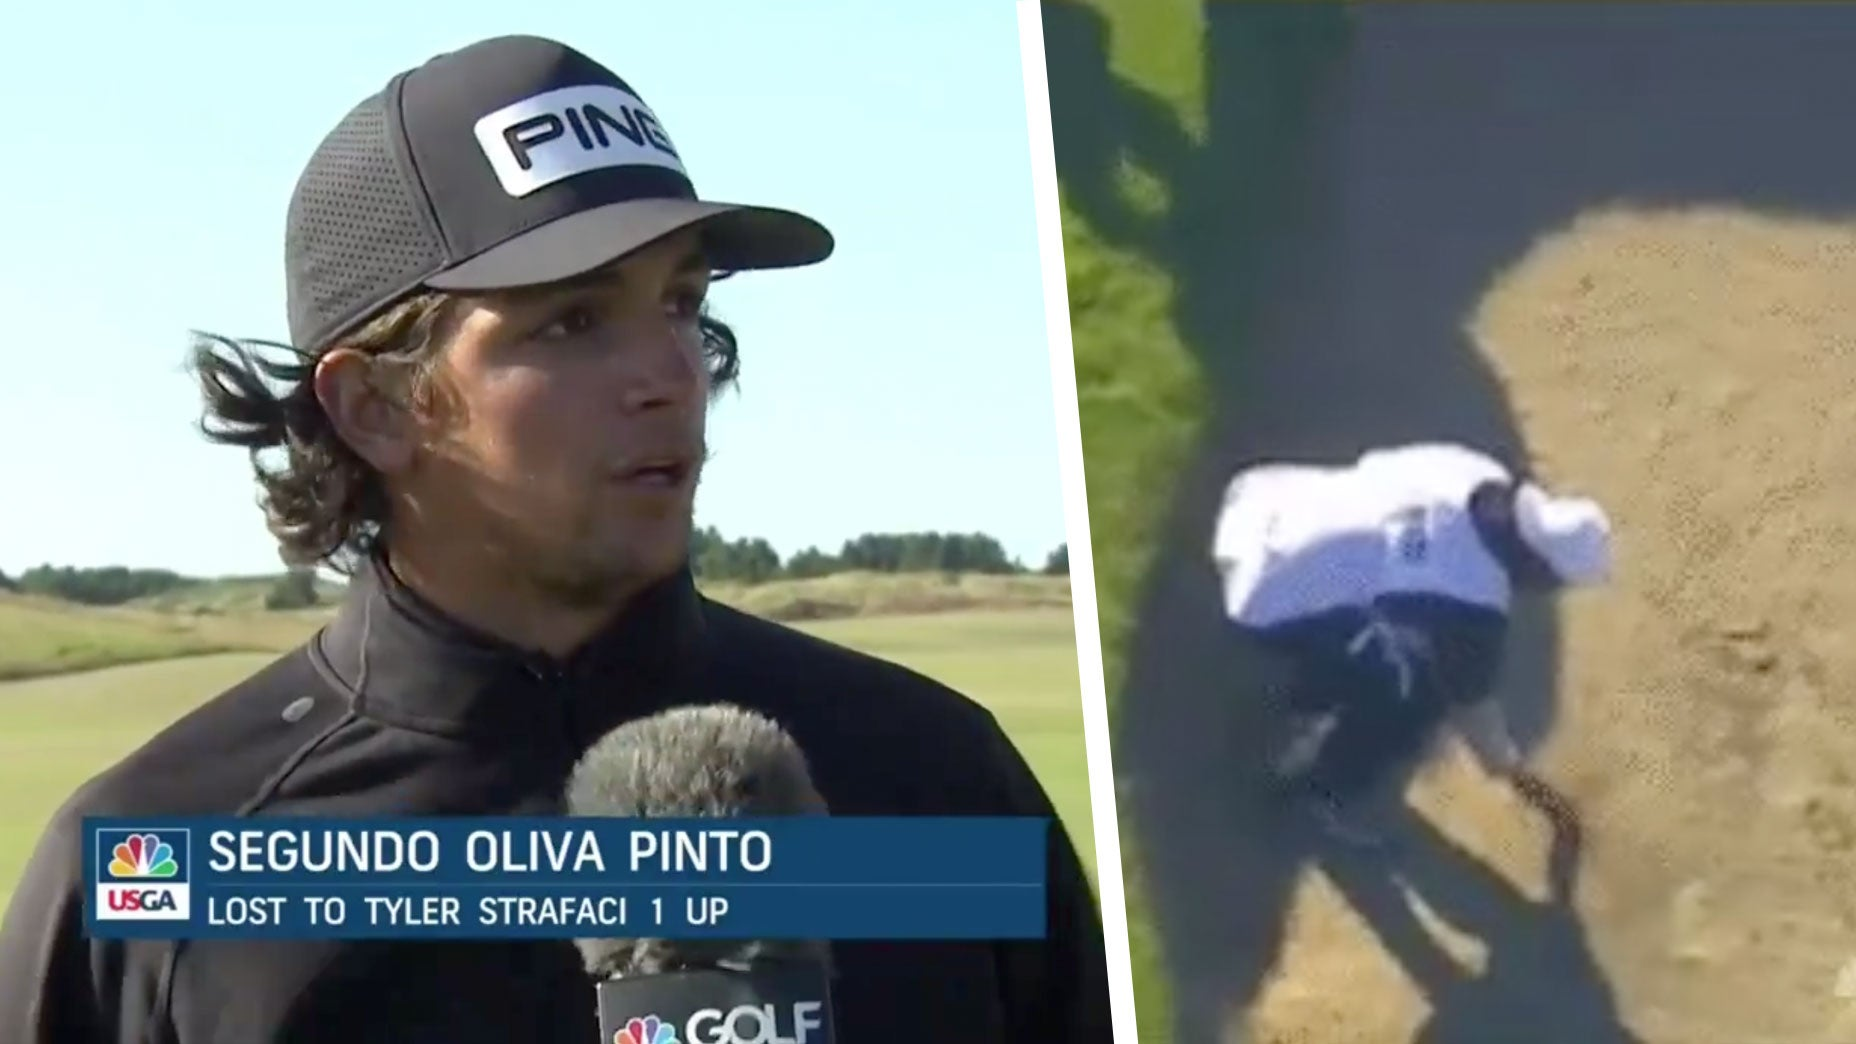 Segundo Oliva Pinto